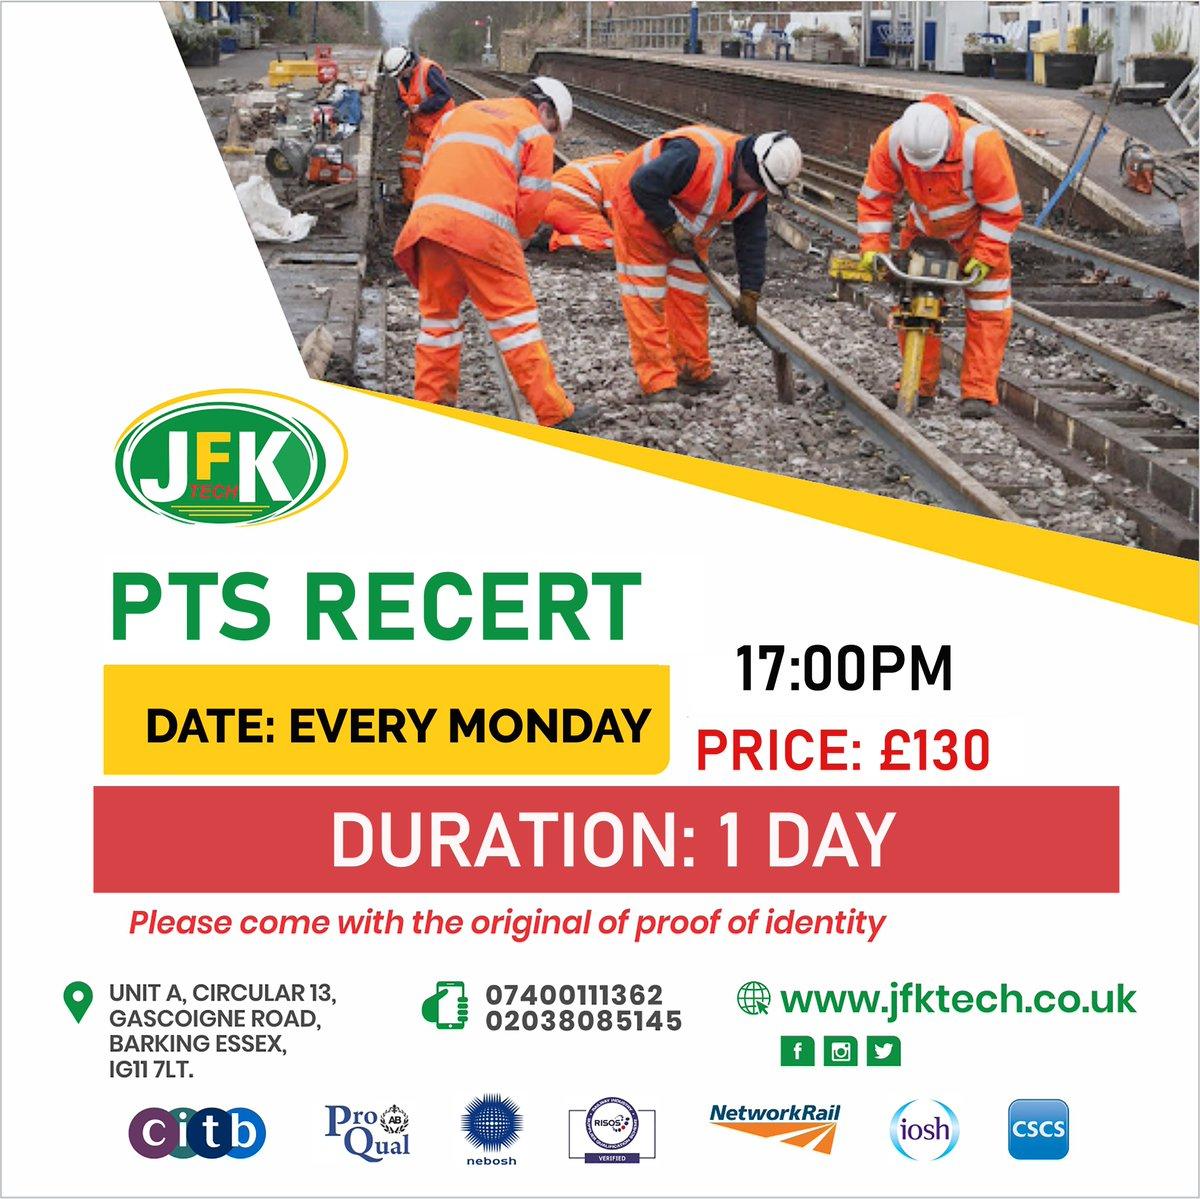 #Construction #ConstructionUK #trafficmarshall #firemarshall #careerdevelopment #uk  #rail #railway #railwayindustry #railwayworker  #railwaycourse #construction #Lamptey #NFL #Tomori #Mendy #Kepa #Allison #Giroud  Call 07400111362 or 02038085145. https://t.co/SEeJ1h64fD https://t.co/mnxMvCkO5L